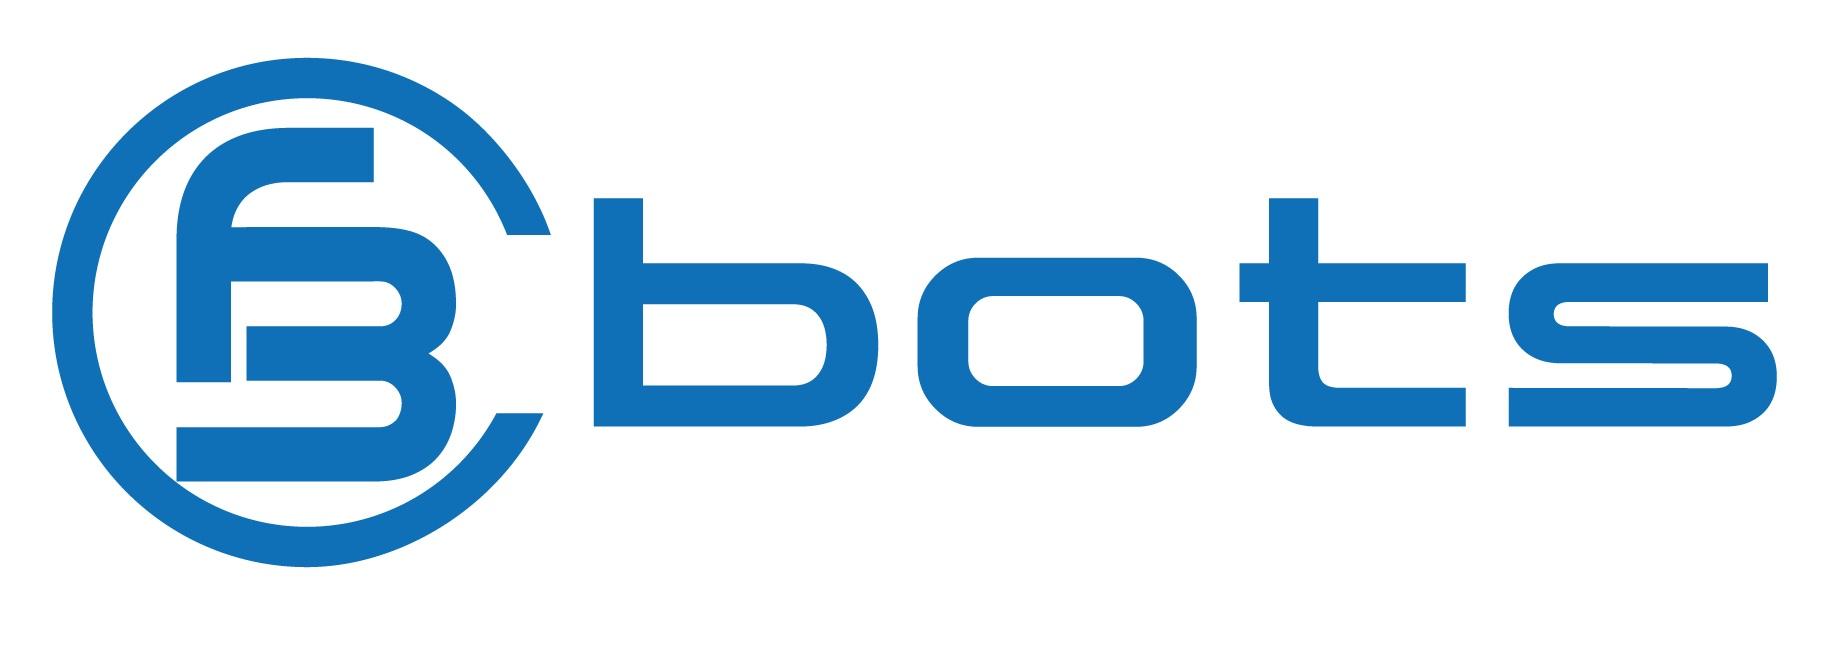 CFB Bots Pte Ltd company logo